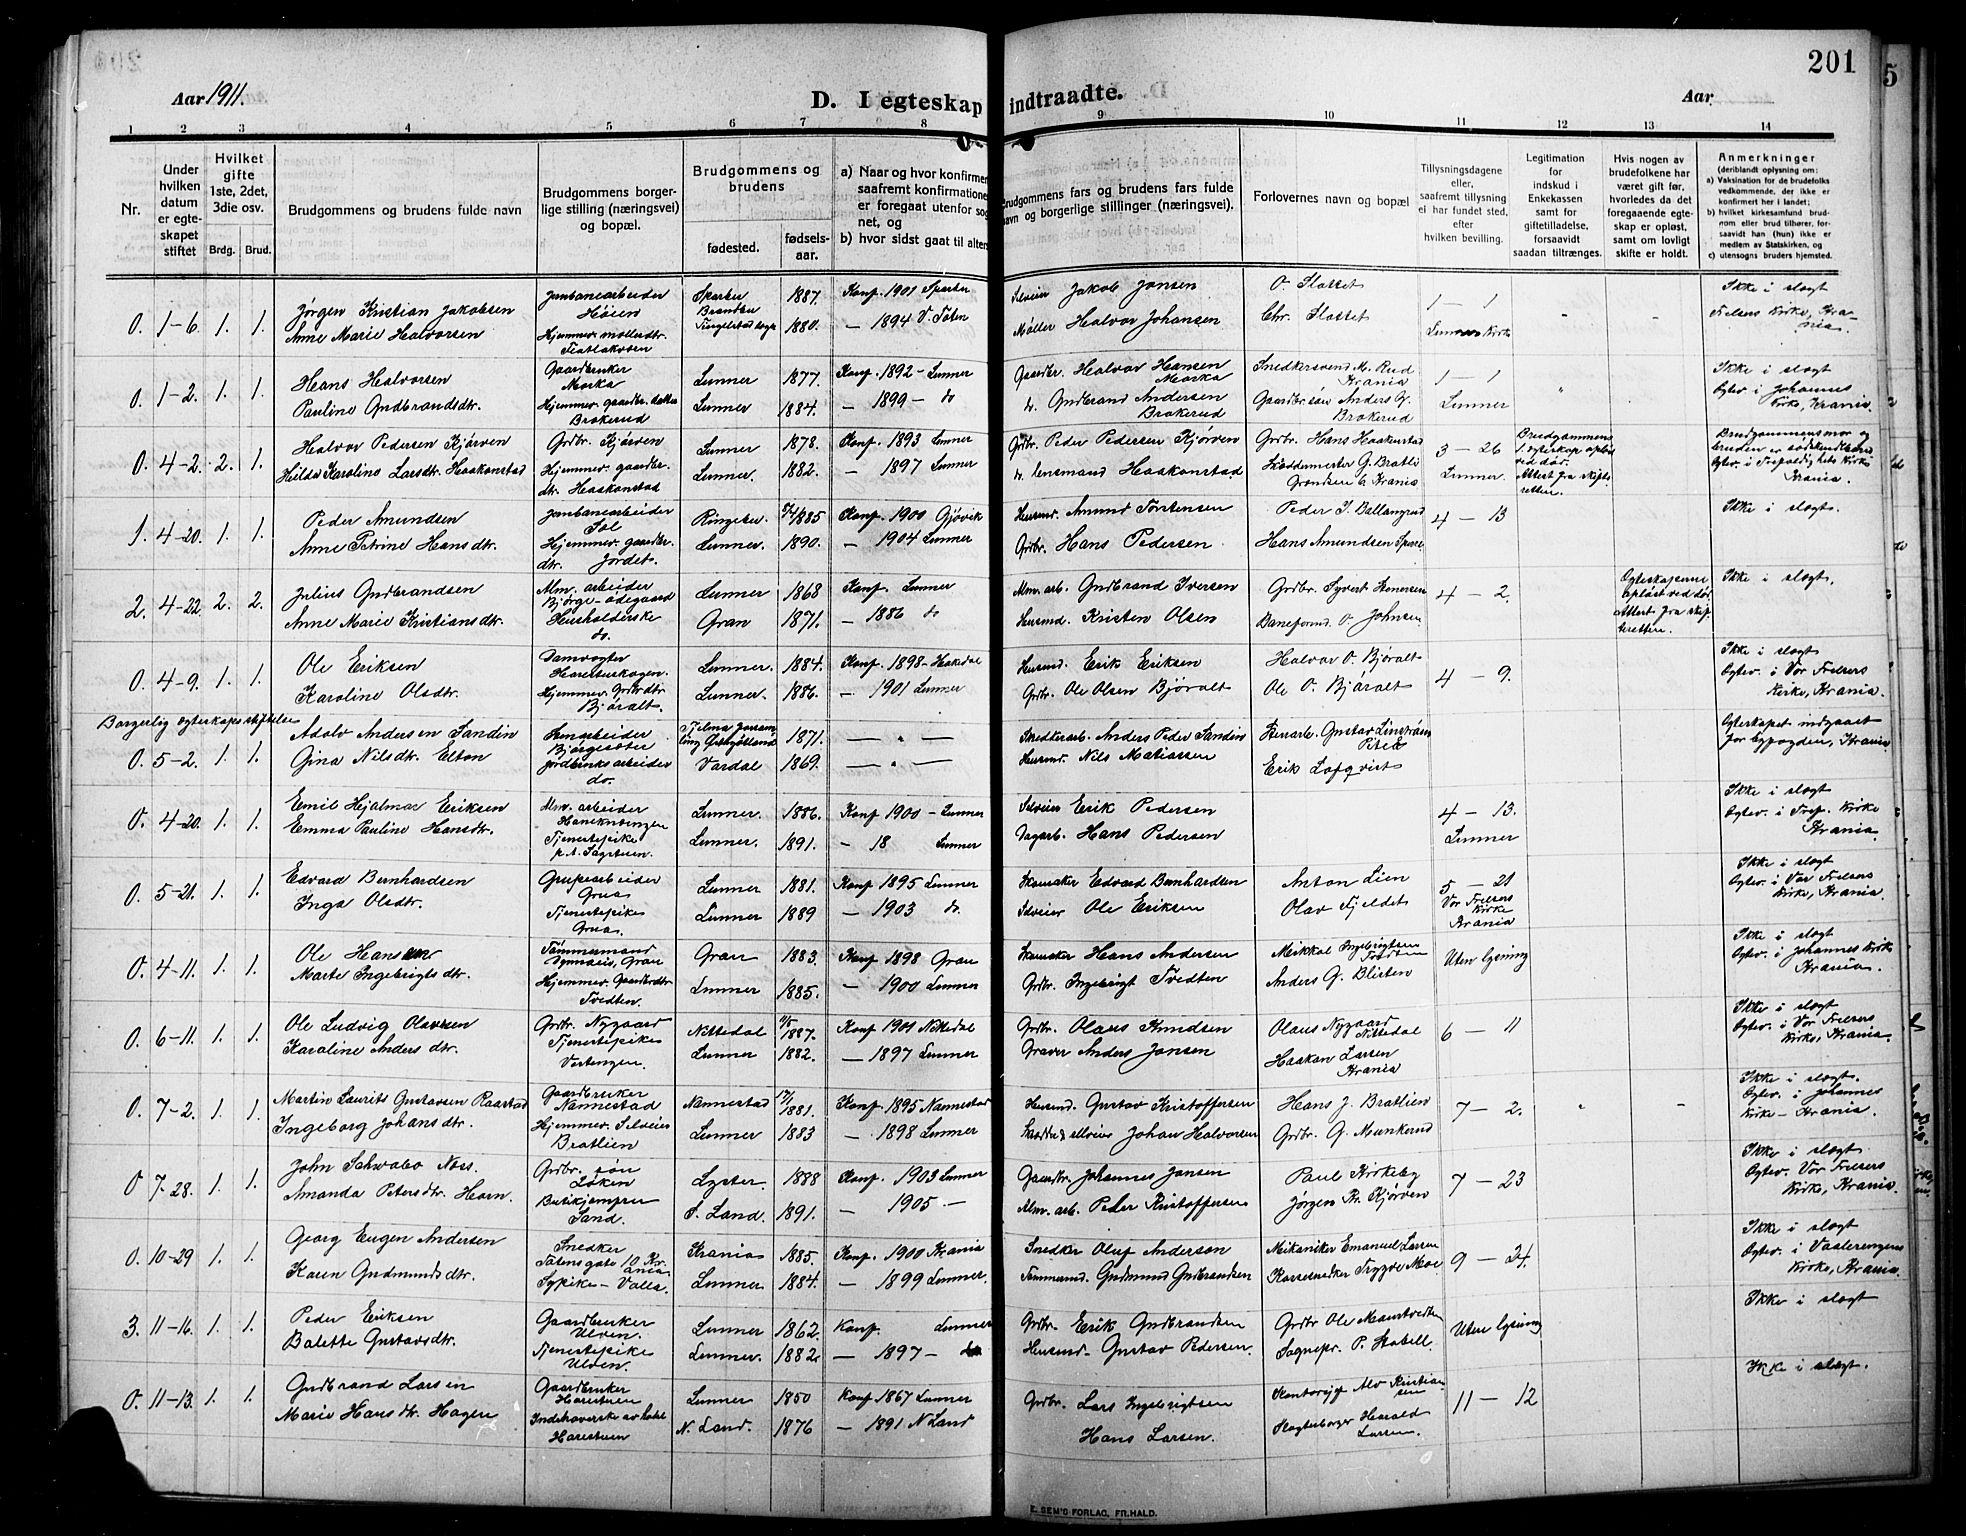 SAH, Lunner prestekontor, H/Ha/Hab/L0001: Klokkerbok nr. 1, 1909-1922, s. 201